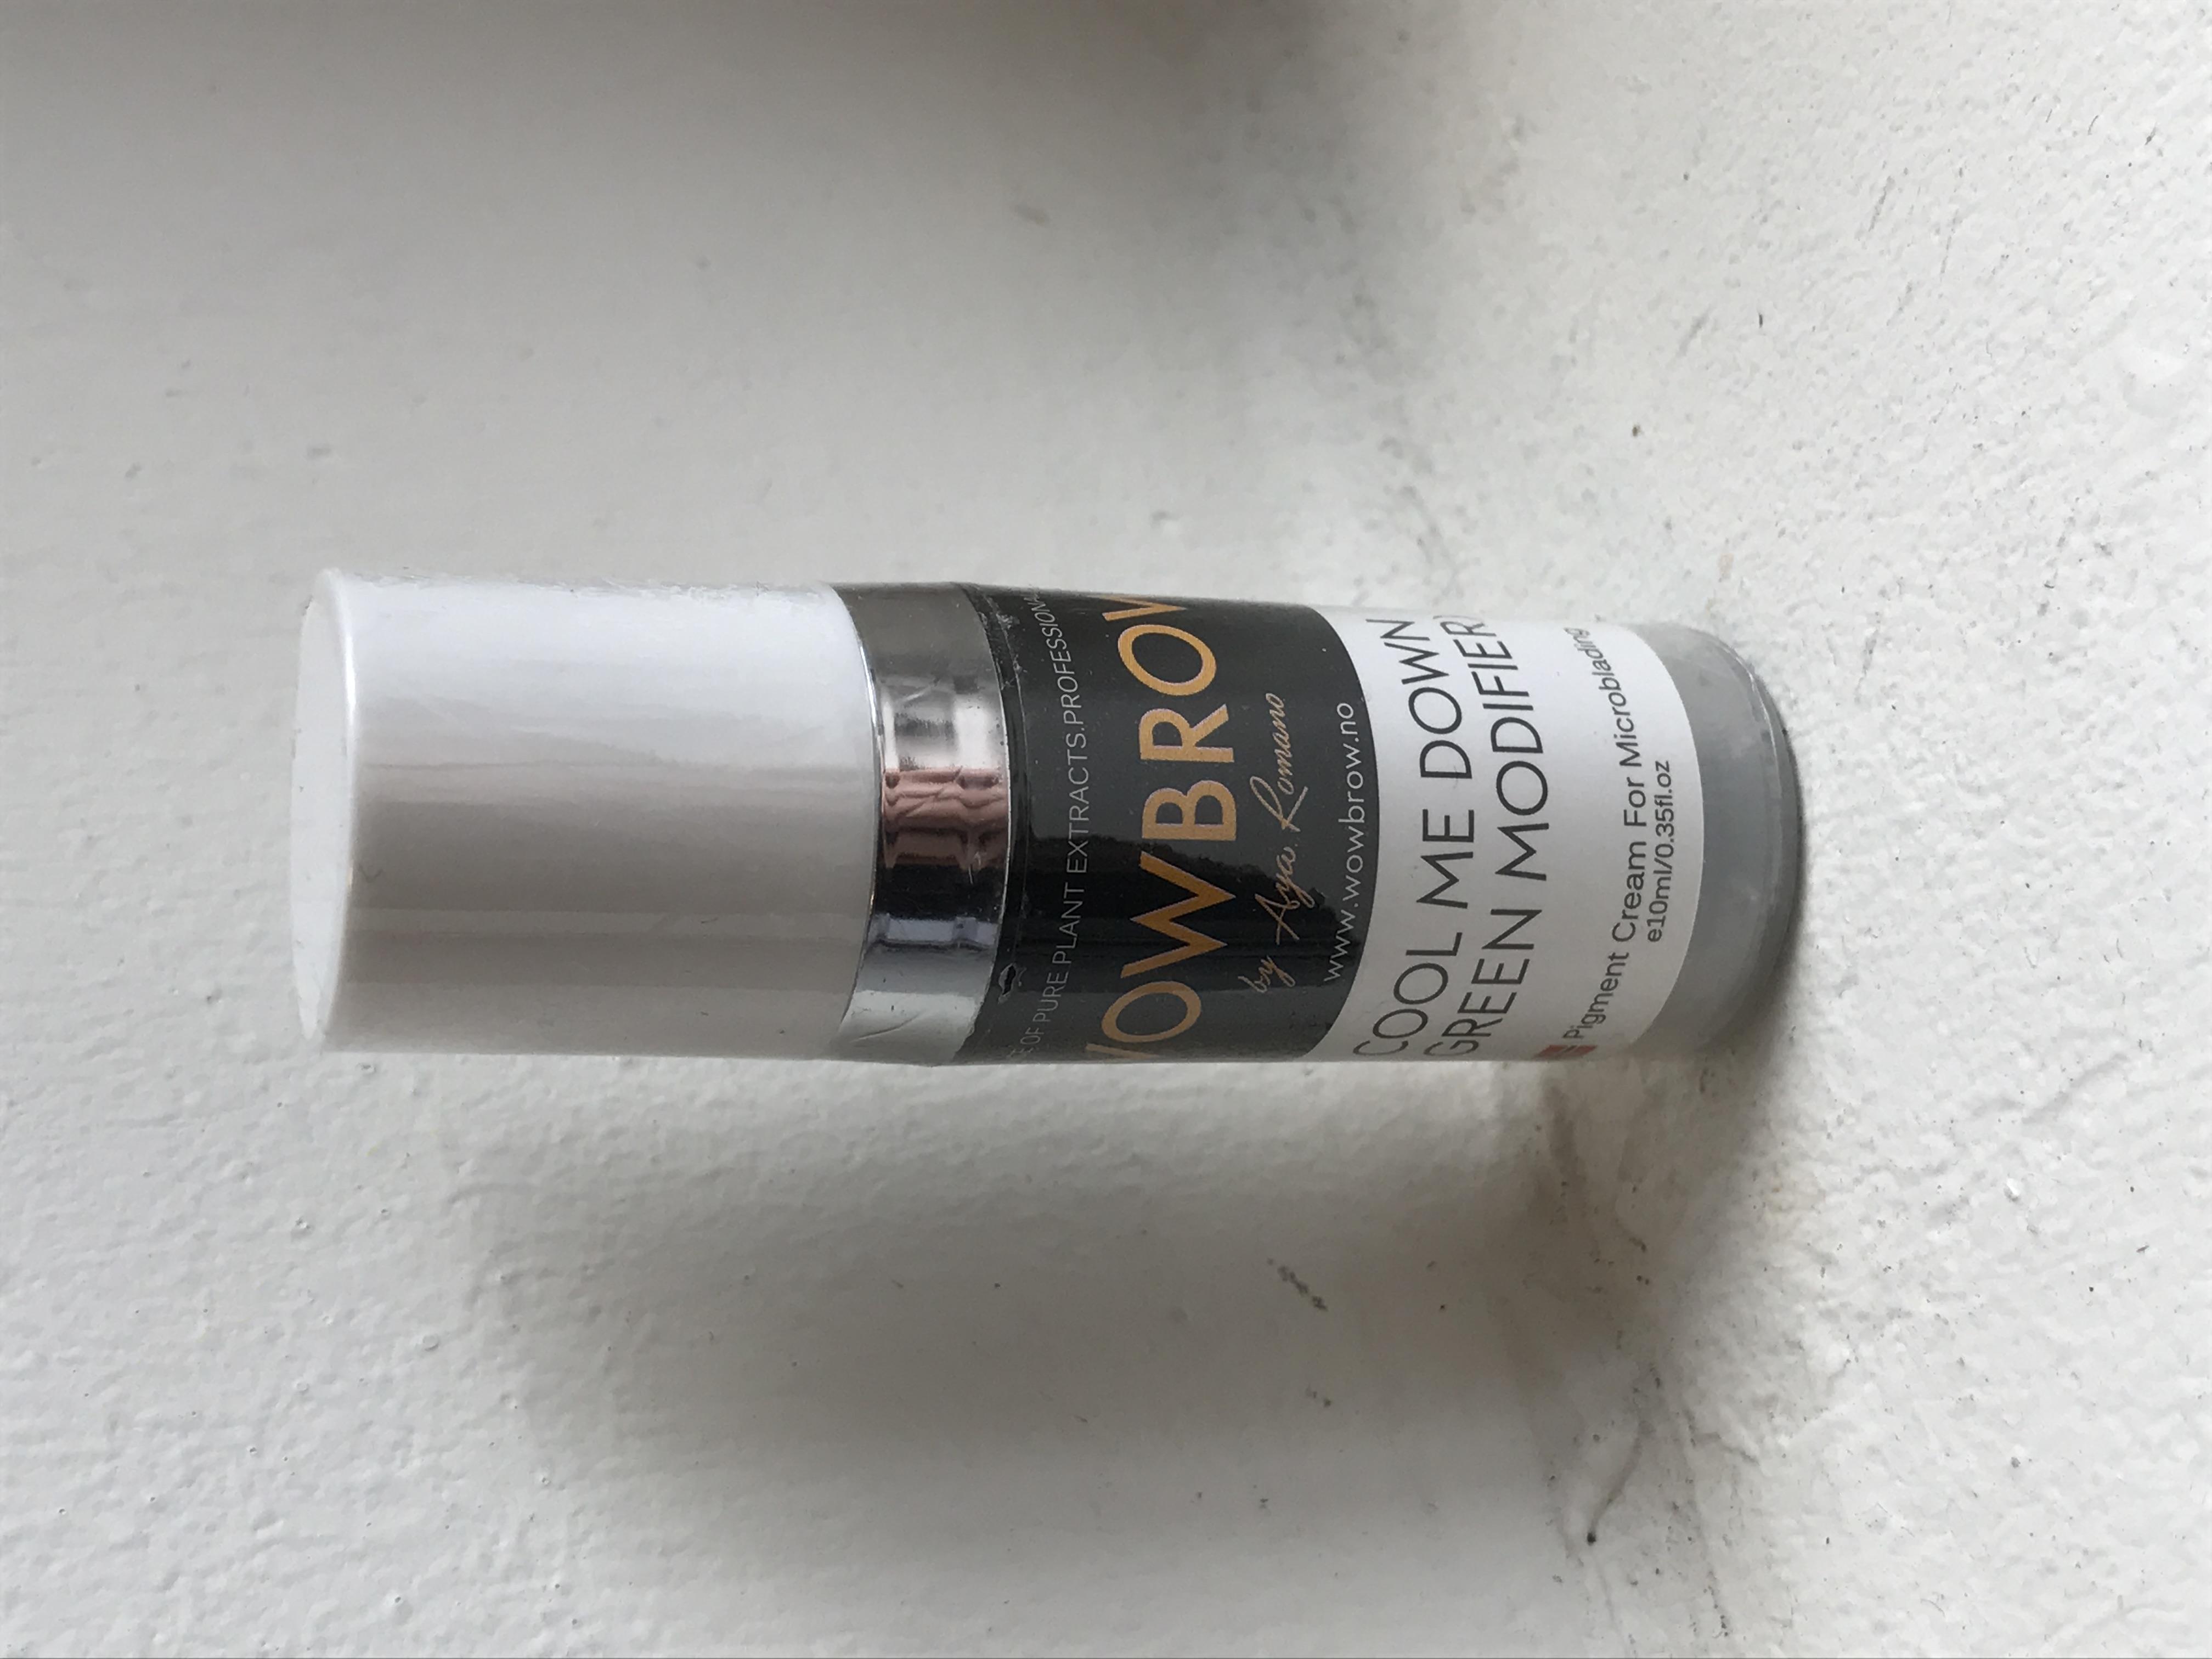 Microblading Pigmenter - Permanent makeup - modifier